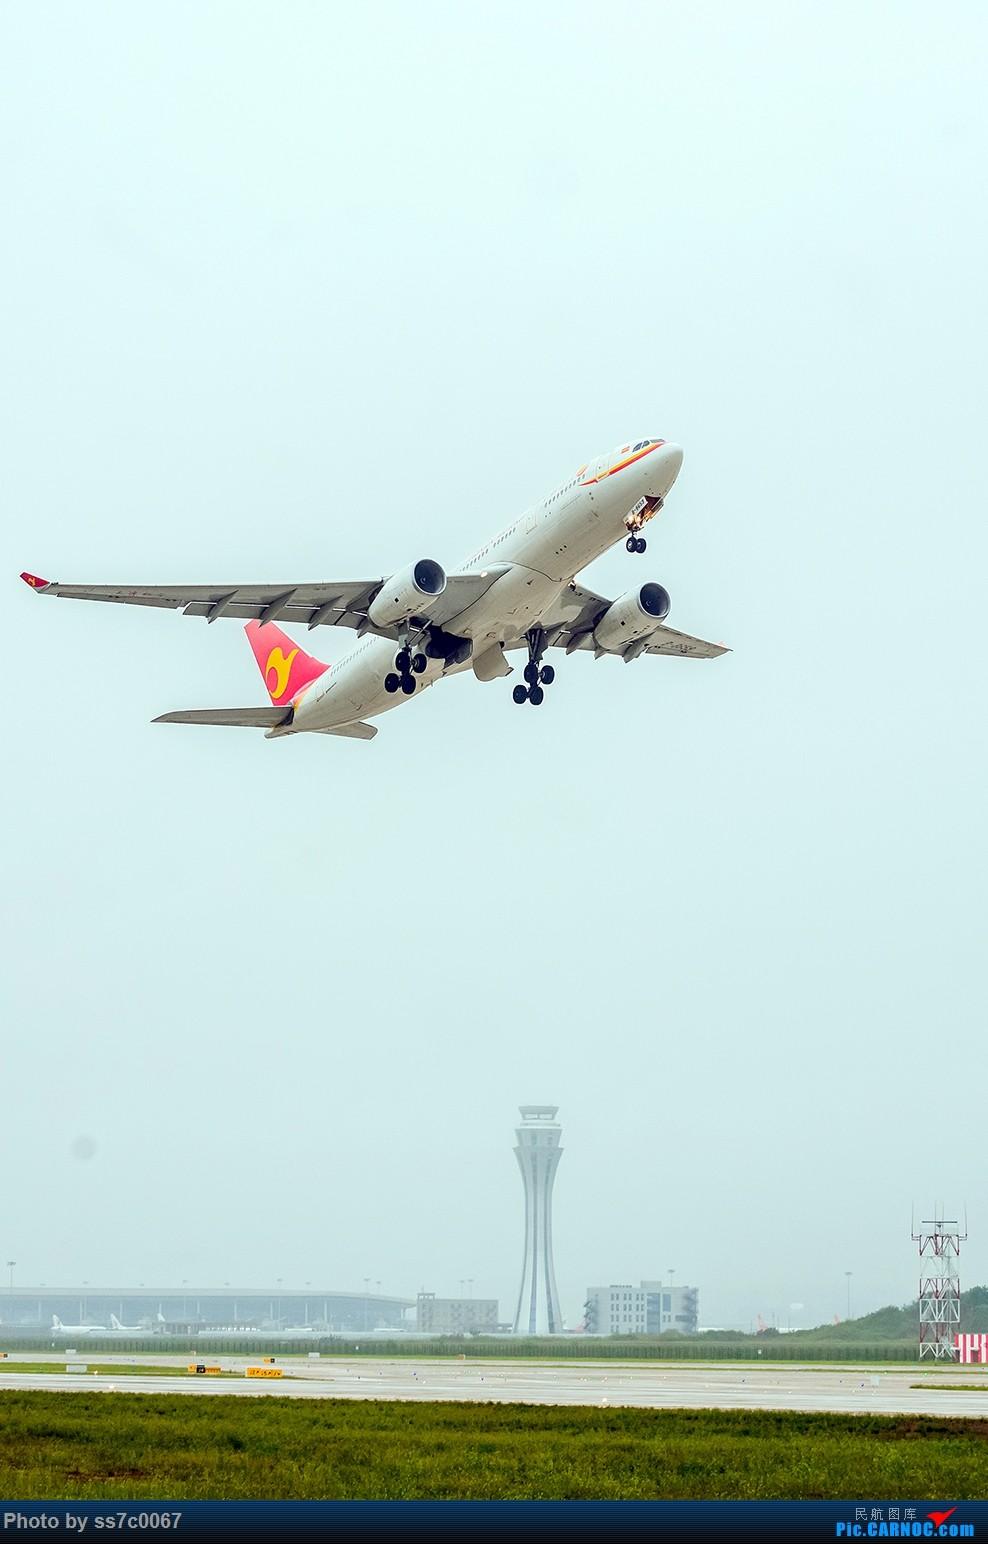 Re:[原创]欢迎2447、紫金号和紫宸号莅临CKG检查工作! AIRBUS A330-200 B-8659 中国重庆江北国际机场